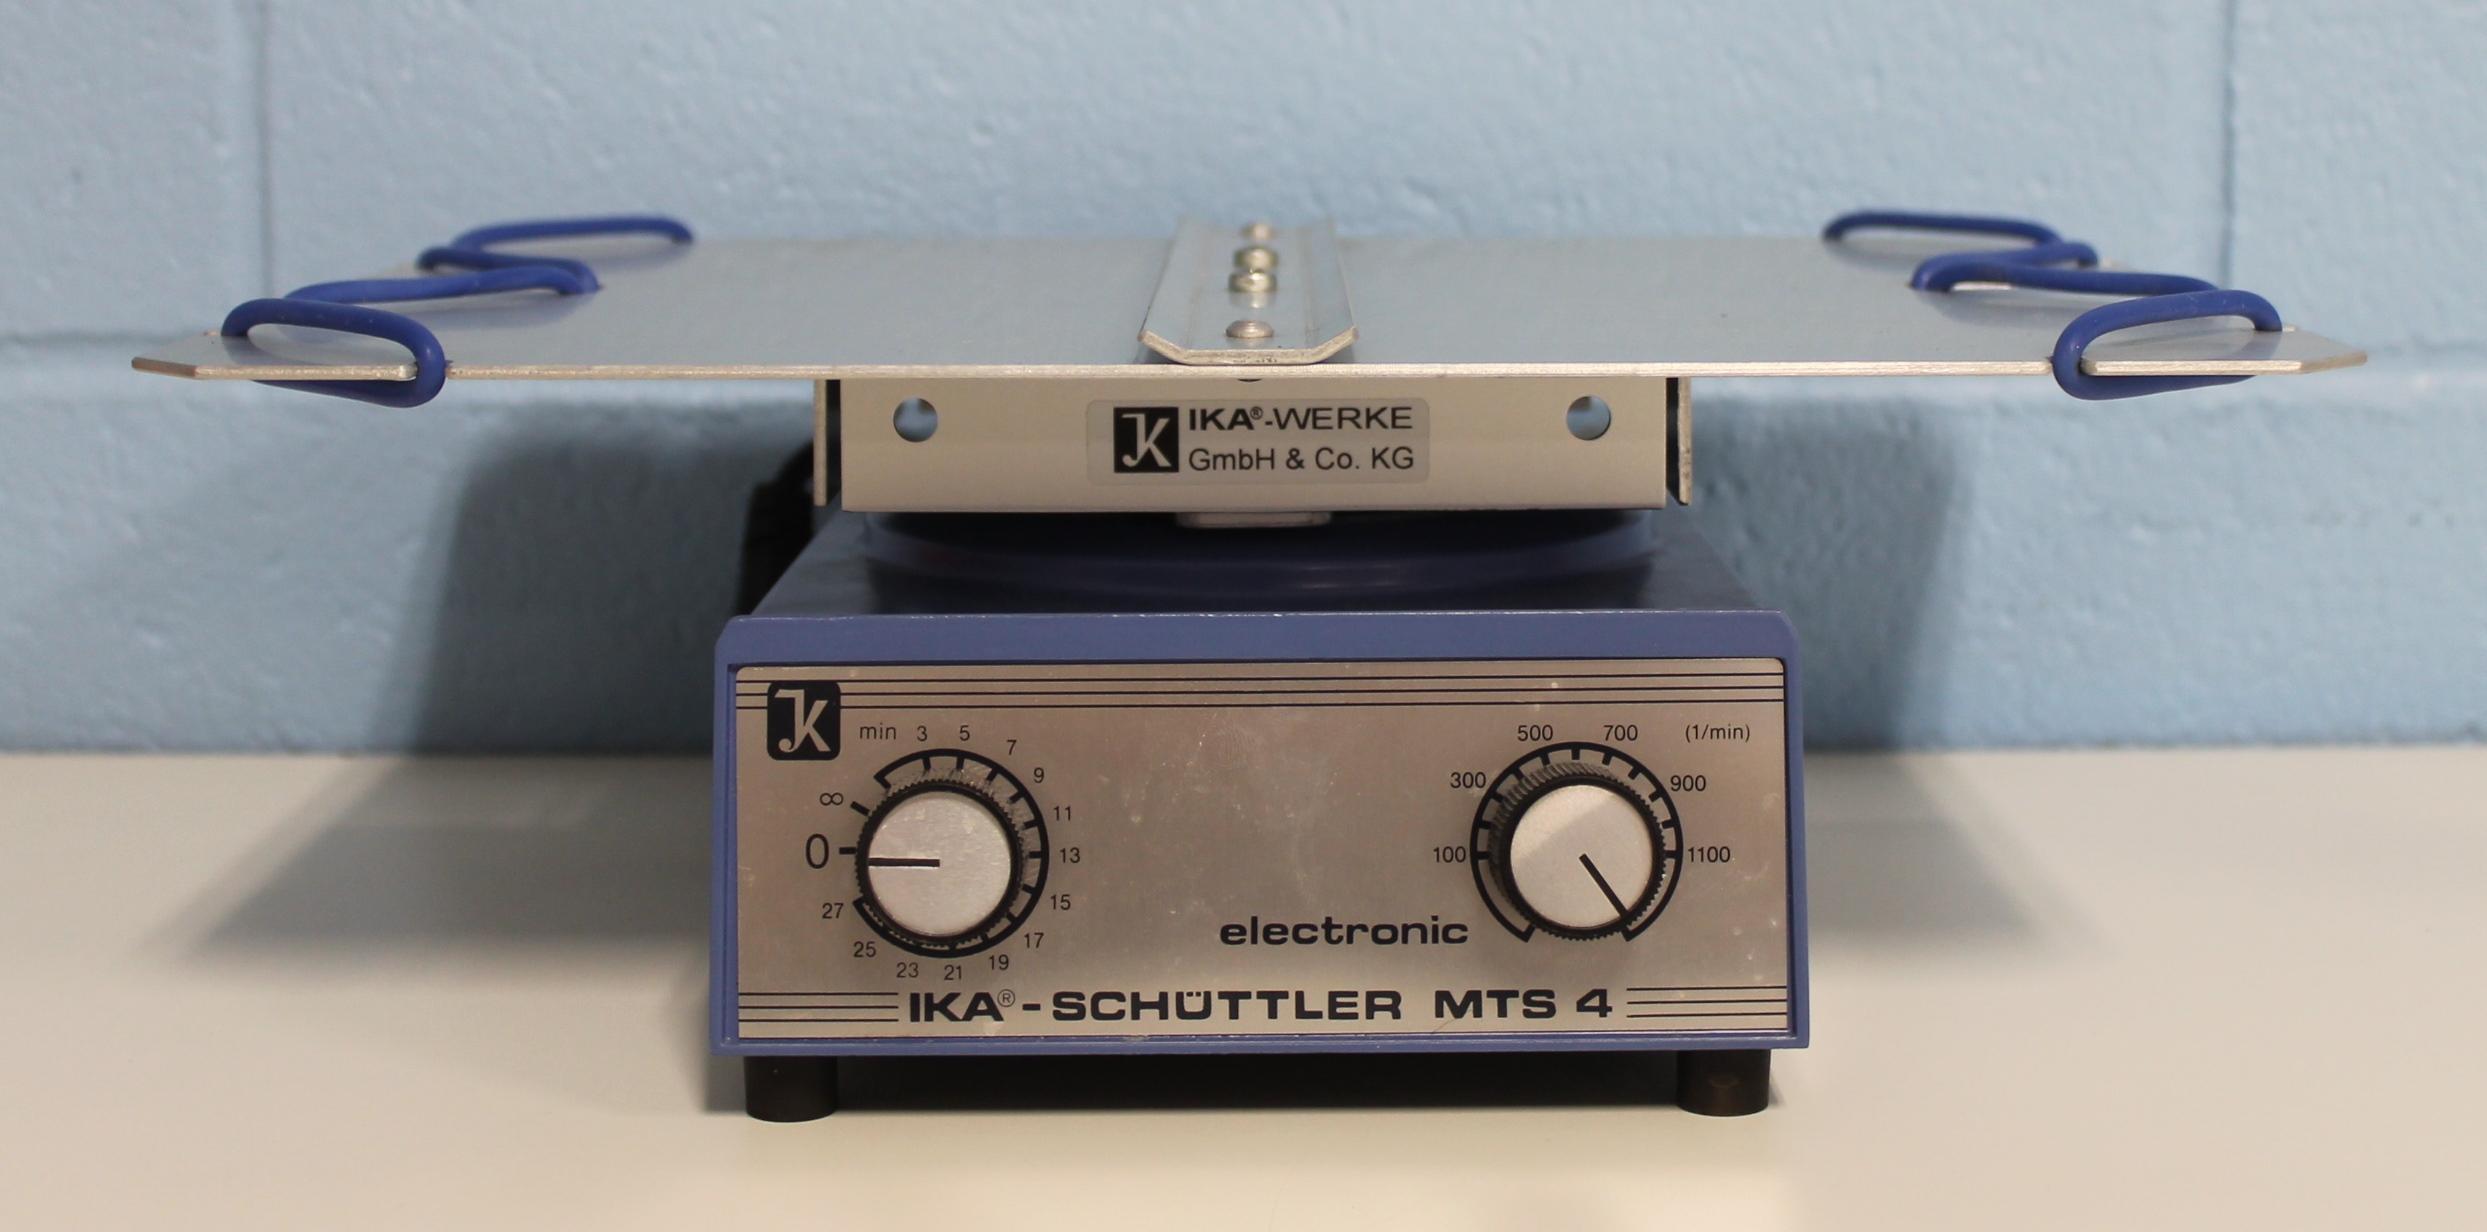 IKA Werke Schuttler MTS 4 S2 Shaker Image